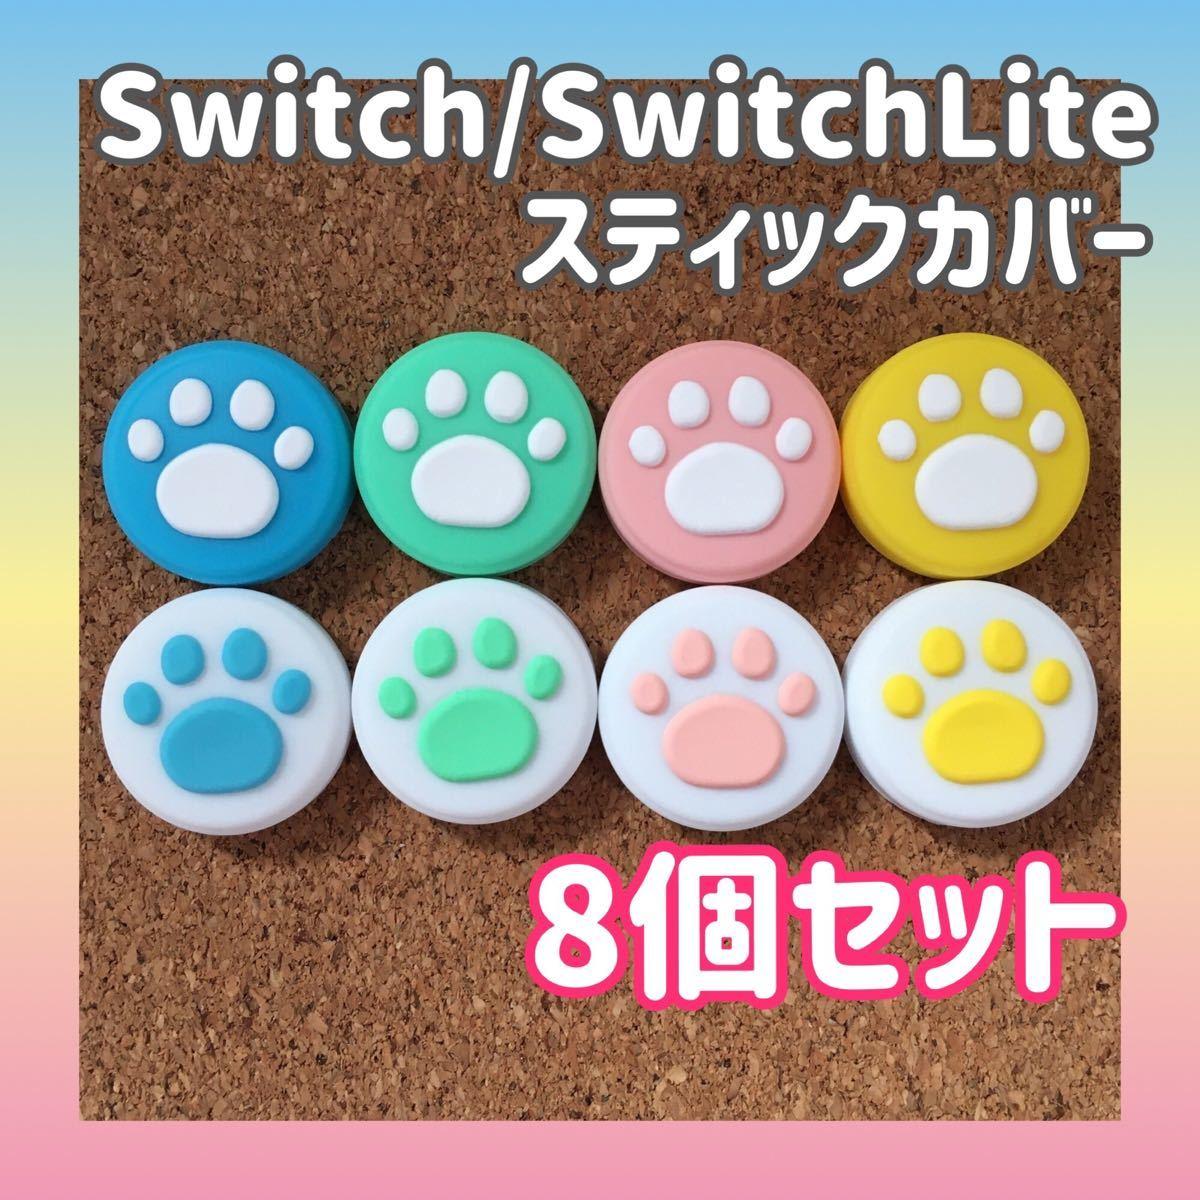 Switch スイッチ ジョイコン スティックカバー 肉球【8個セット】Nintendo Switch Liteにも対応